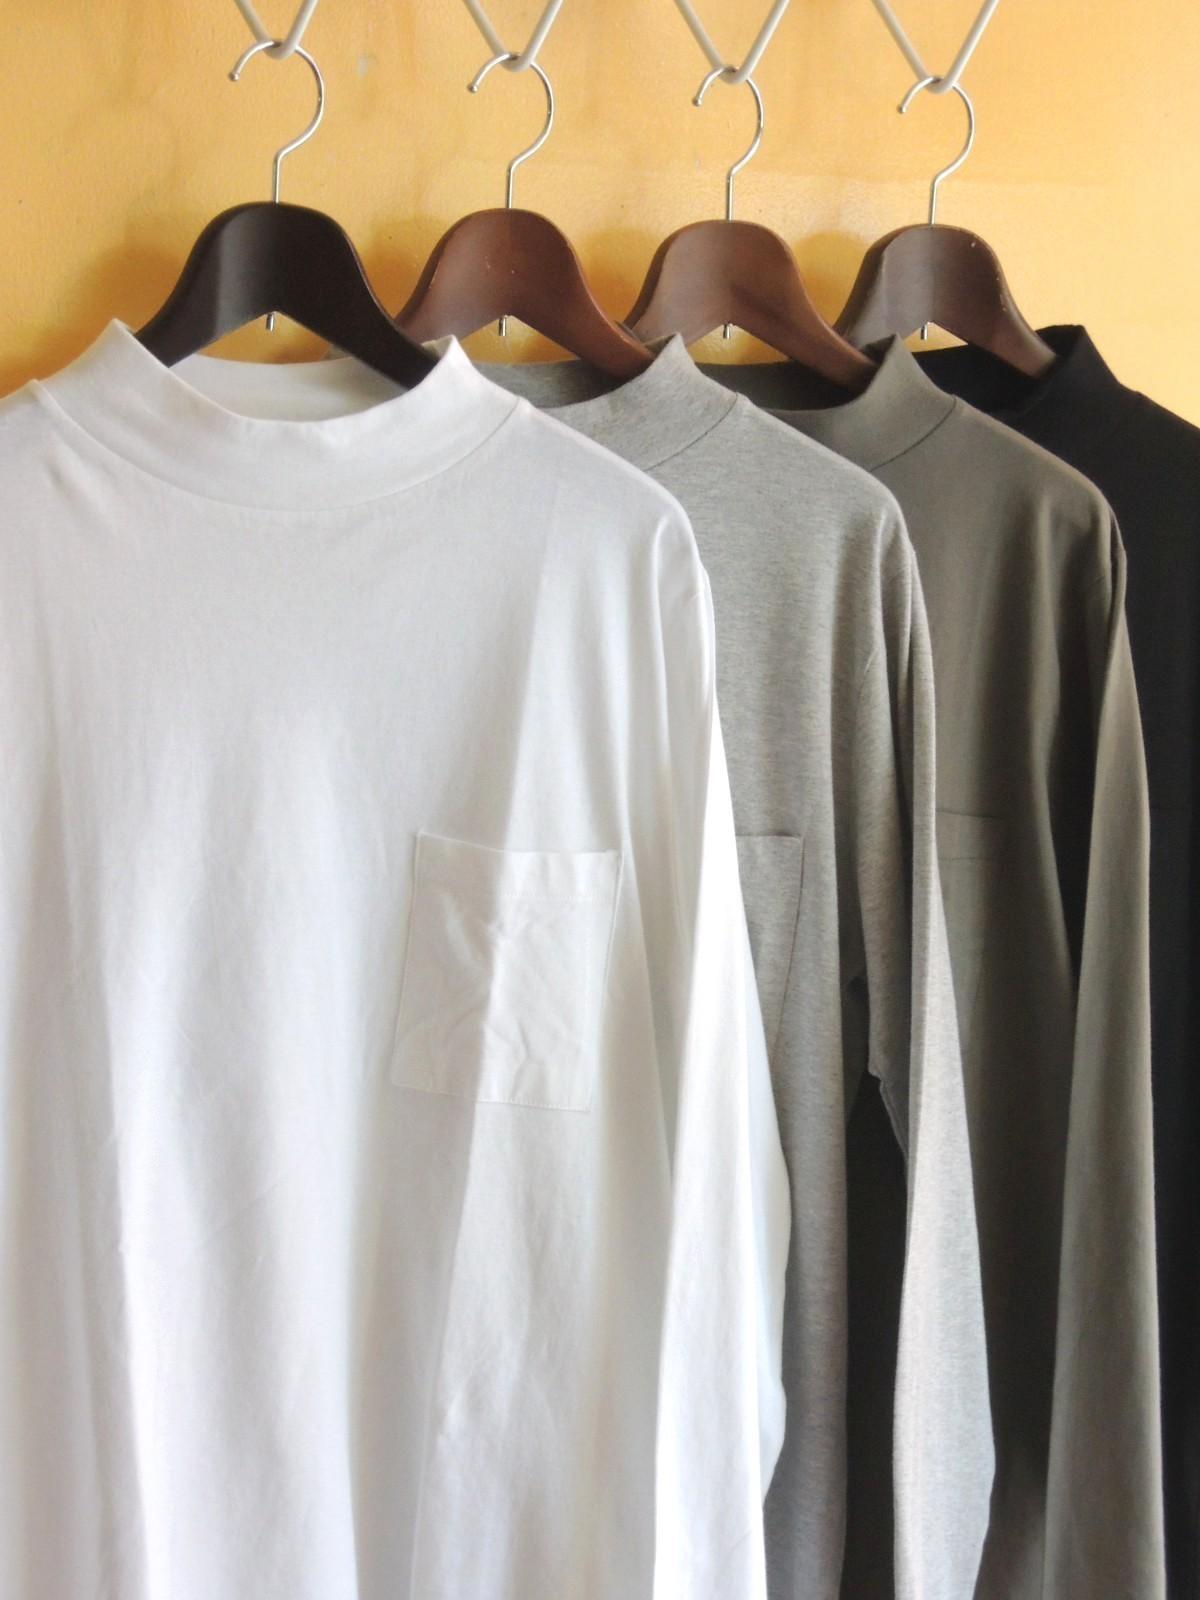 mockneckpockettshirts01.JPG